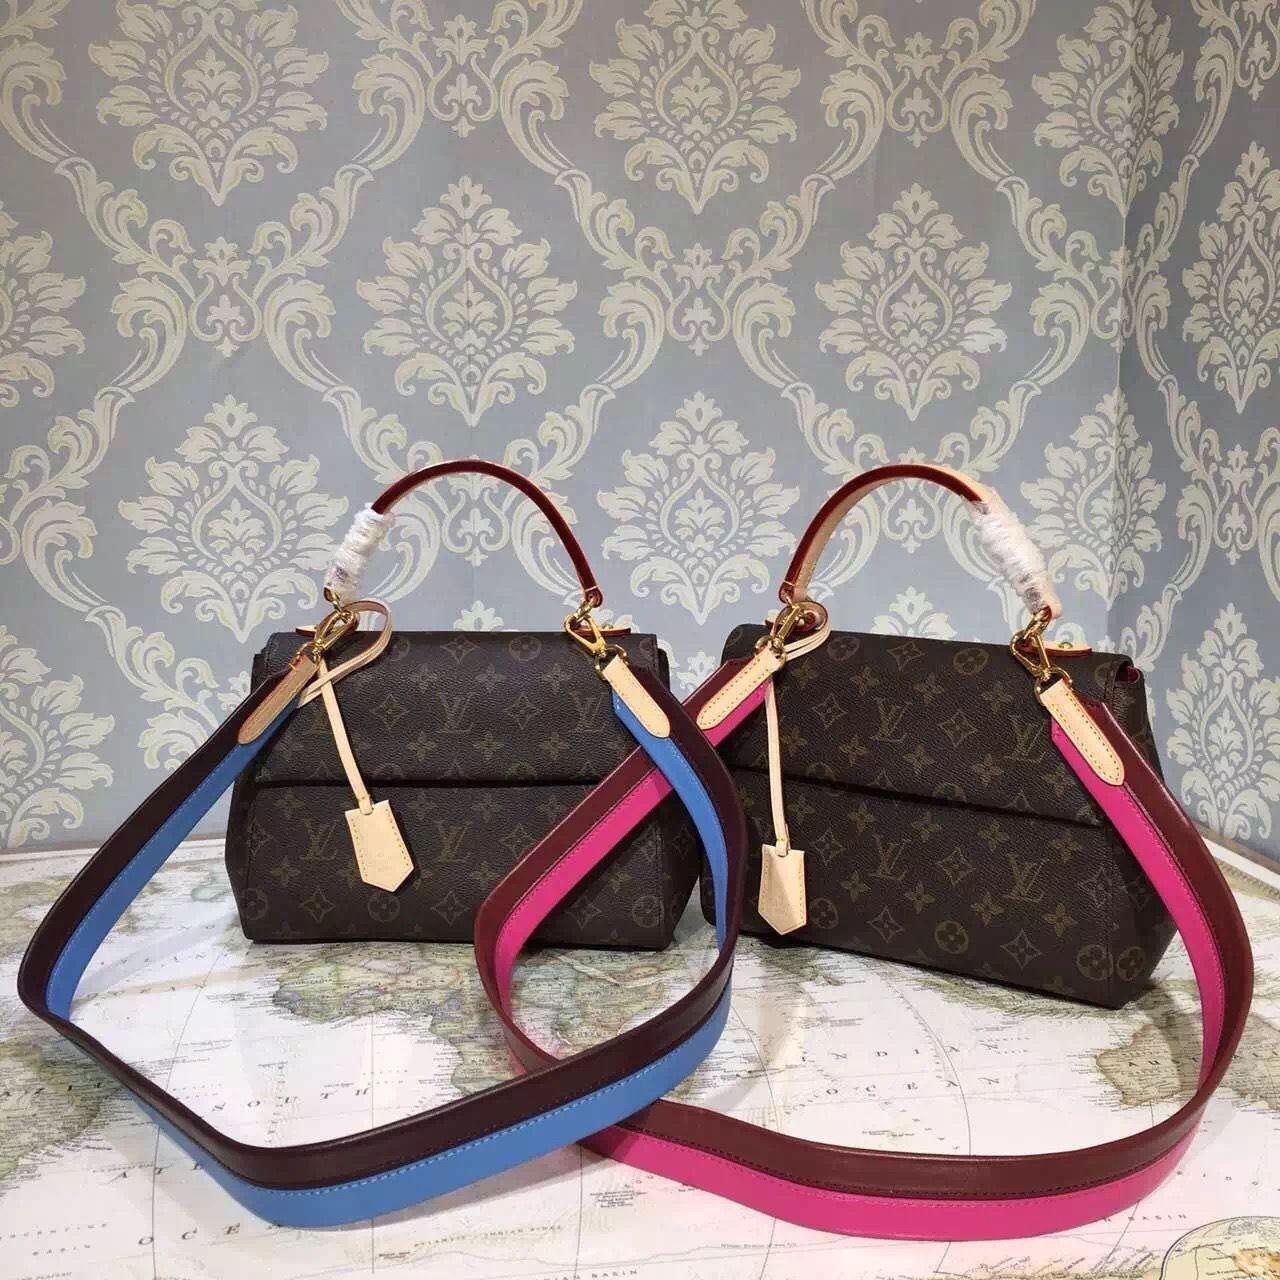 40866d0cabf8 Louis Vuitton Monogram Canvas Cluny BB Bag M42738 2016 (Fuchsia Burgundy  Strap)